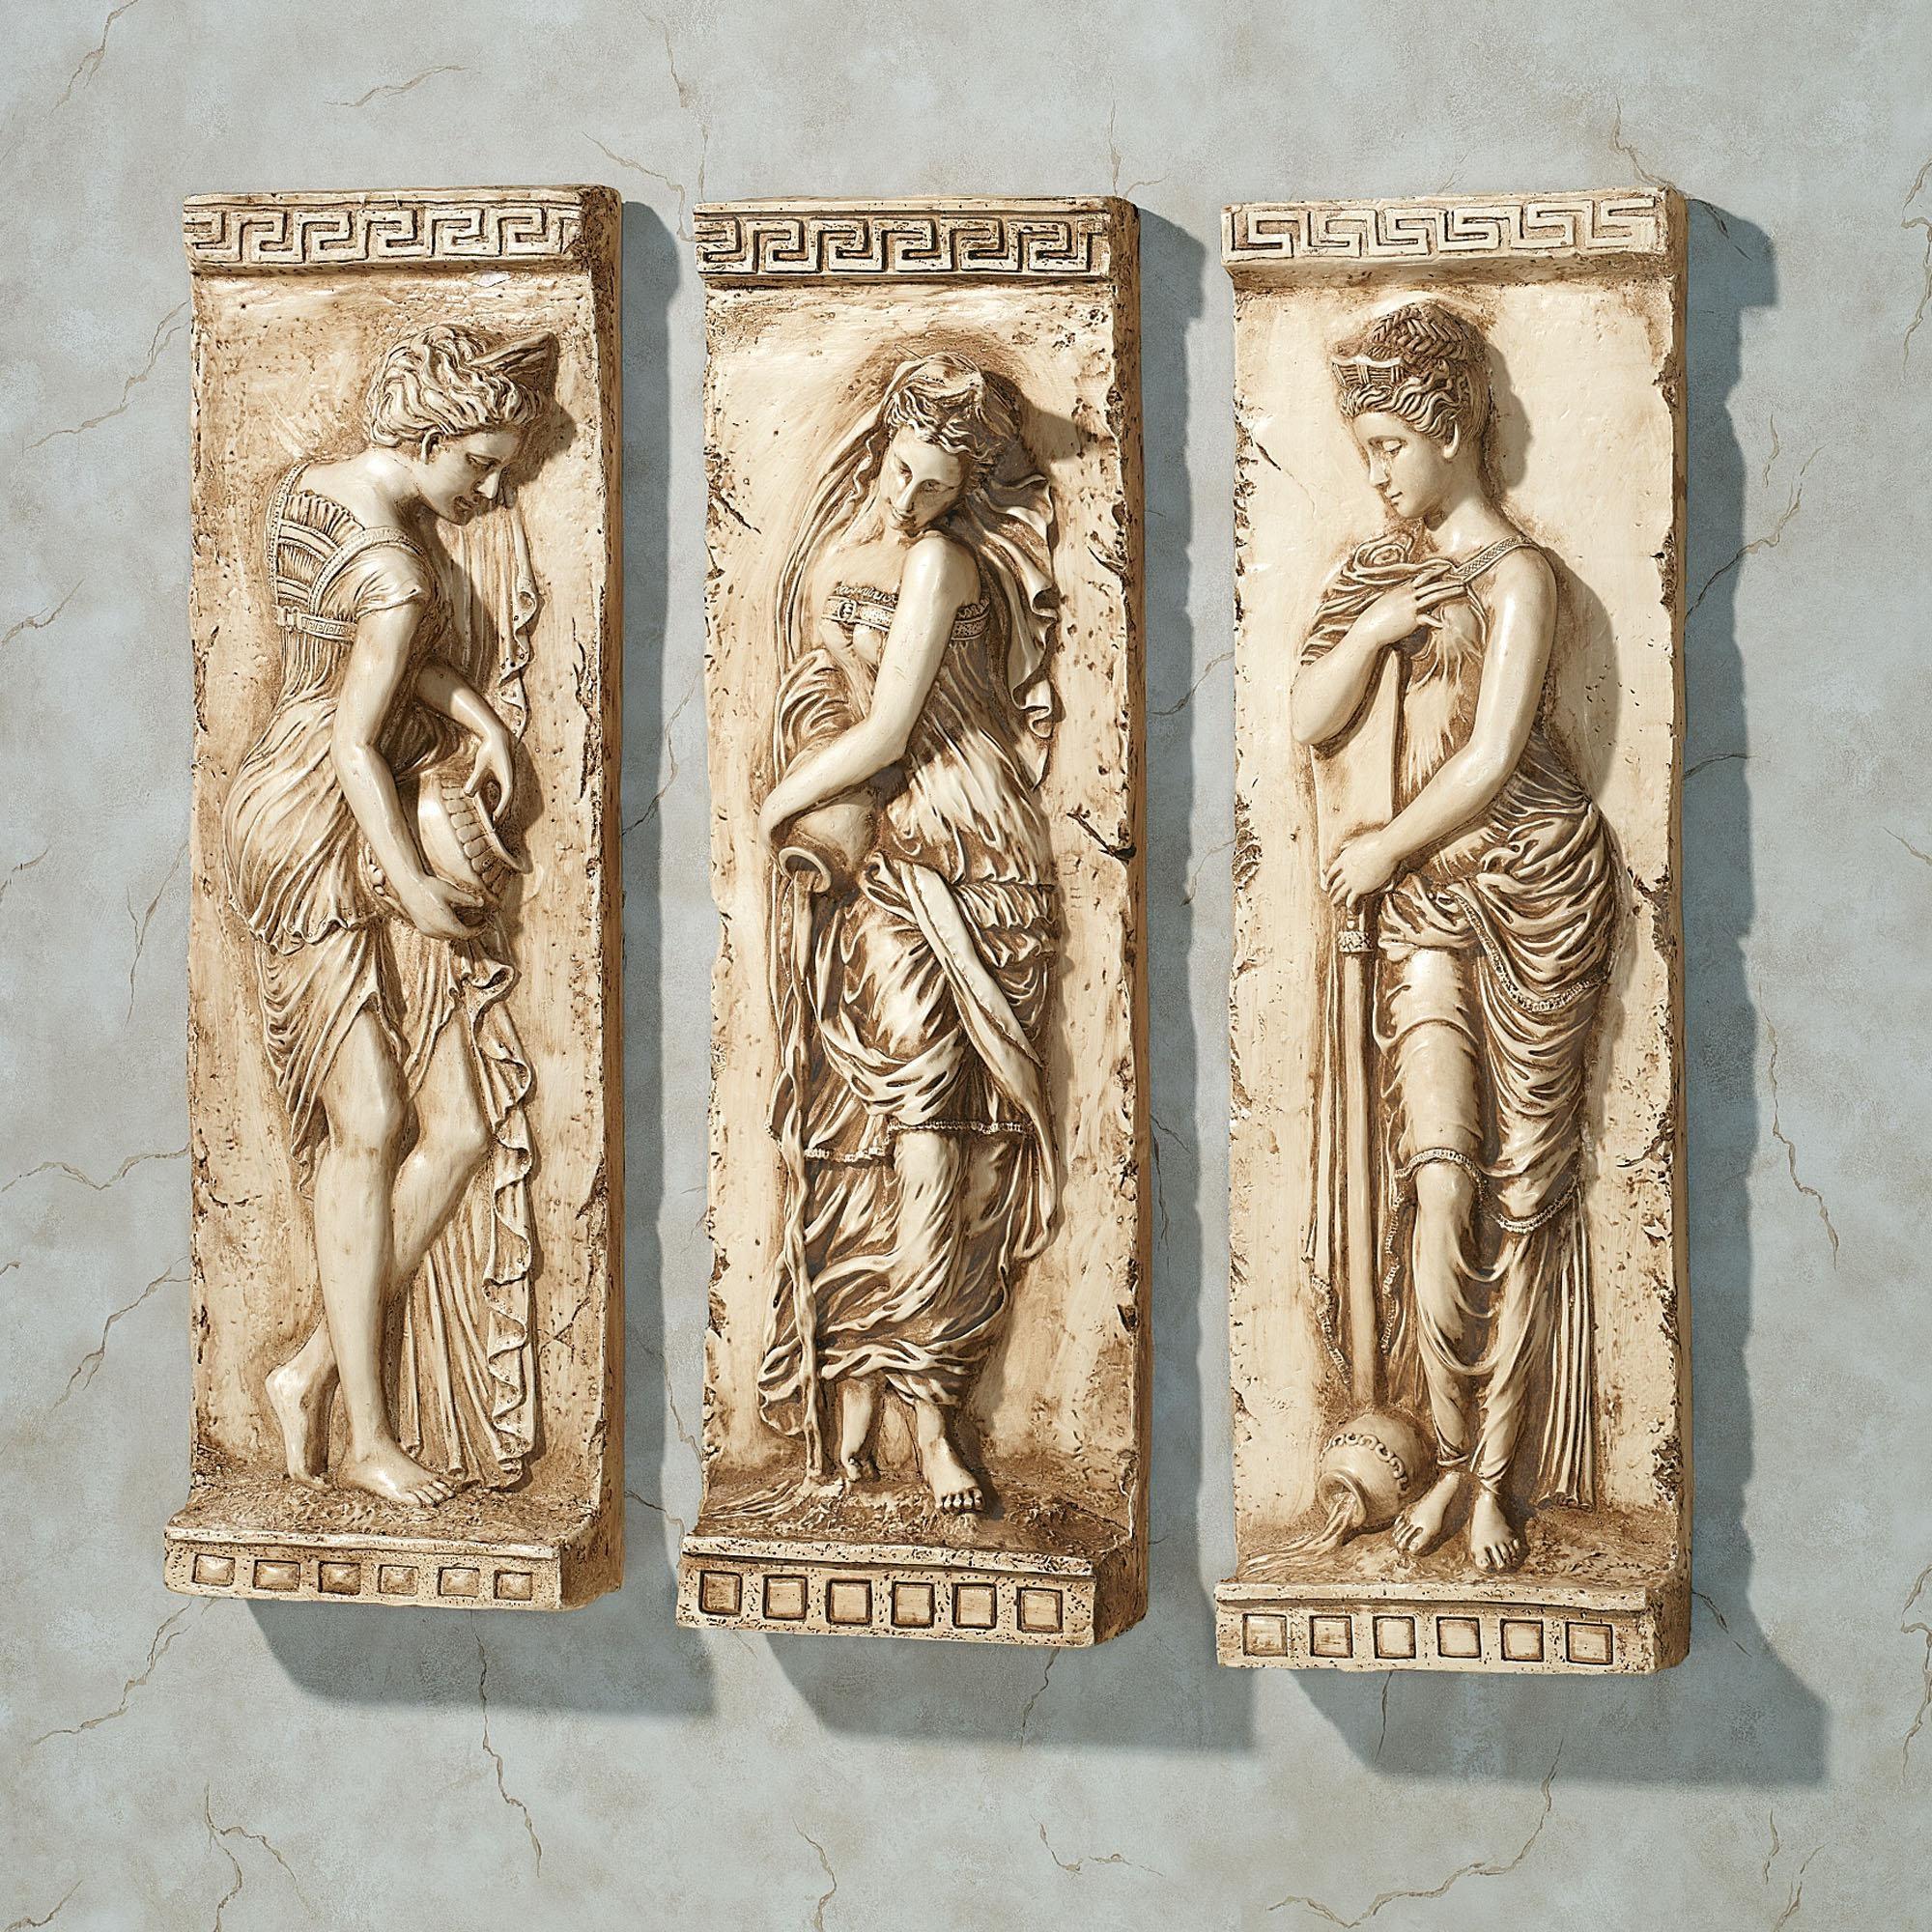 Wall Art Ideas Design : Reusable Metal Ancient Greek Wall Art Intended For Ancient Greek Wall Art (View 2 of 20)